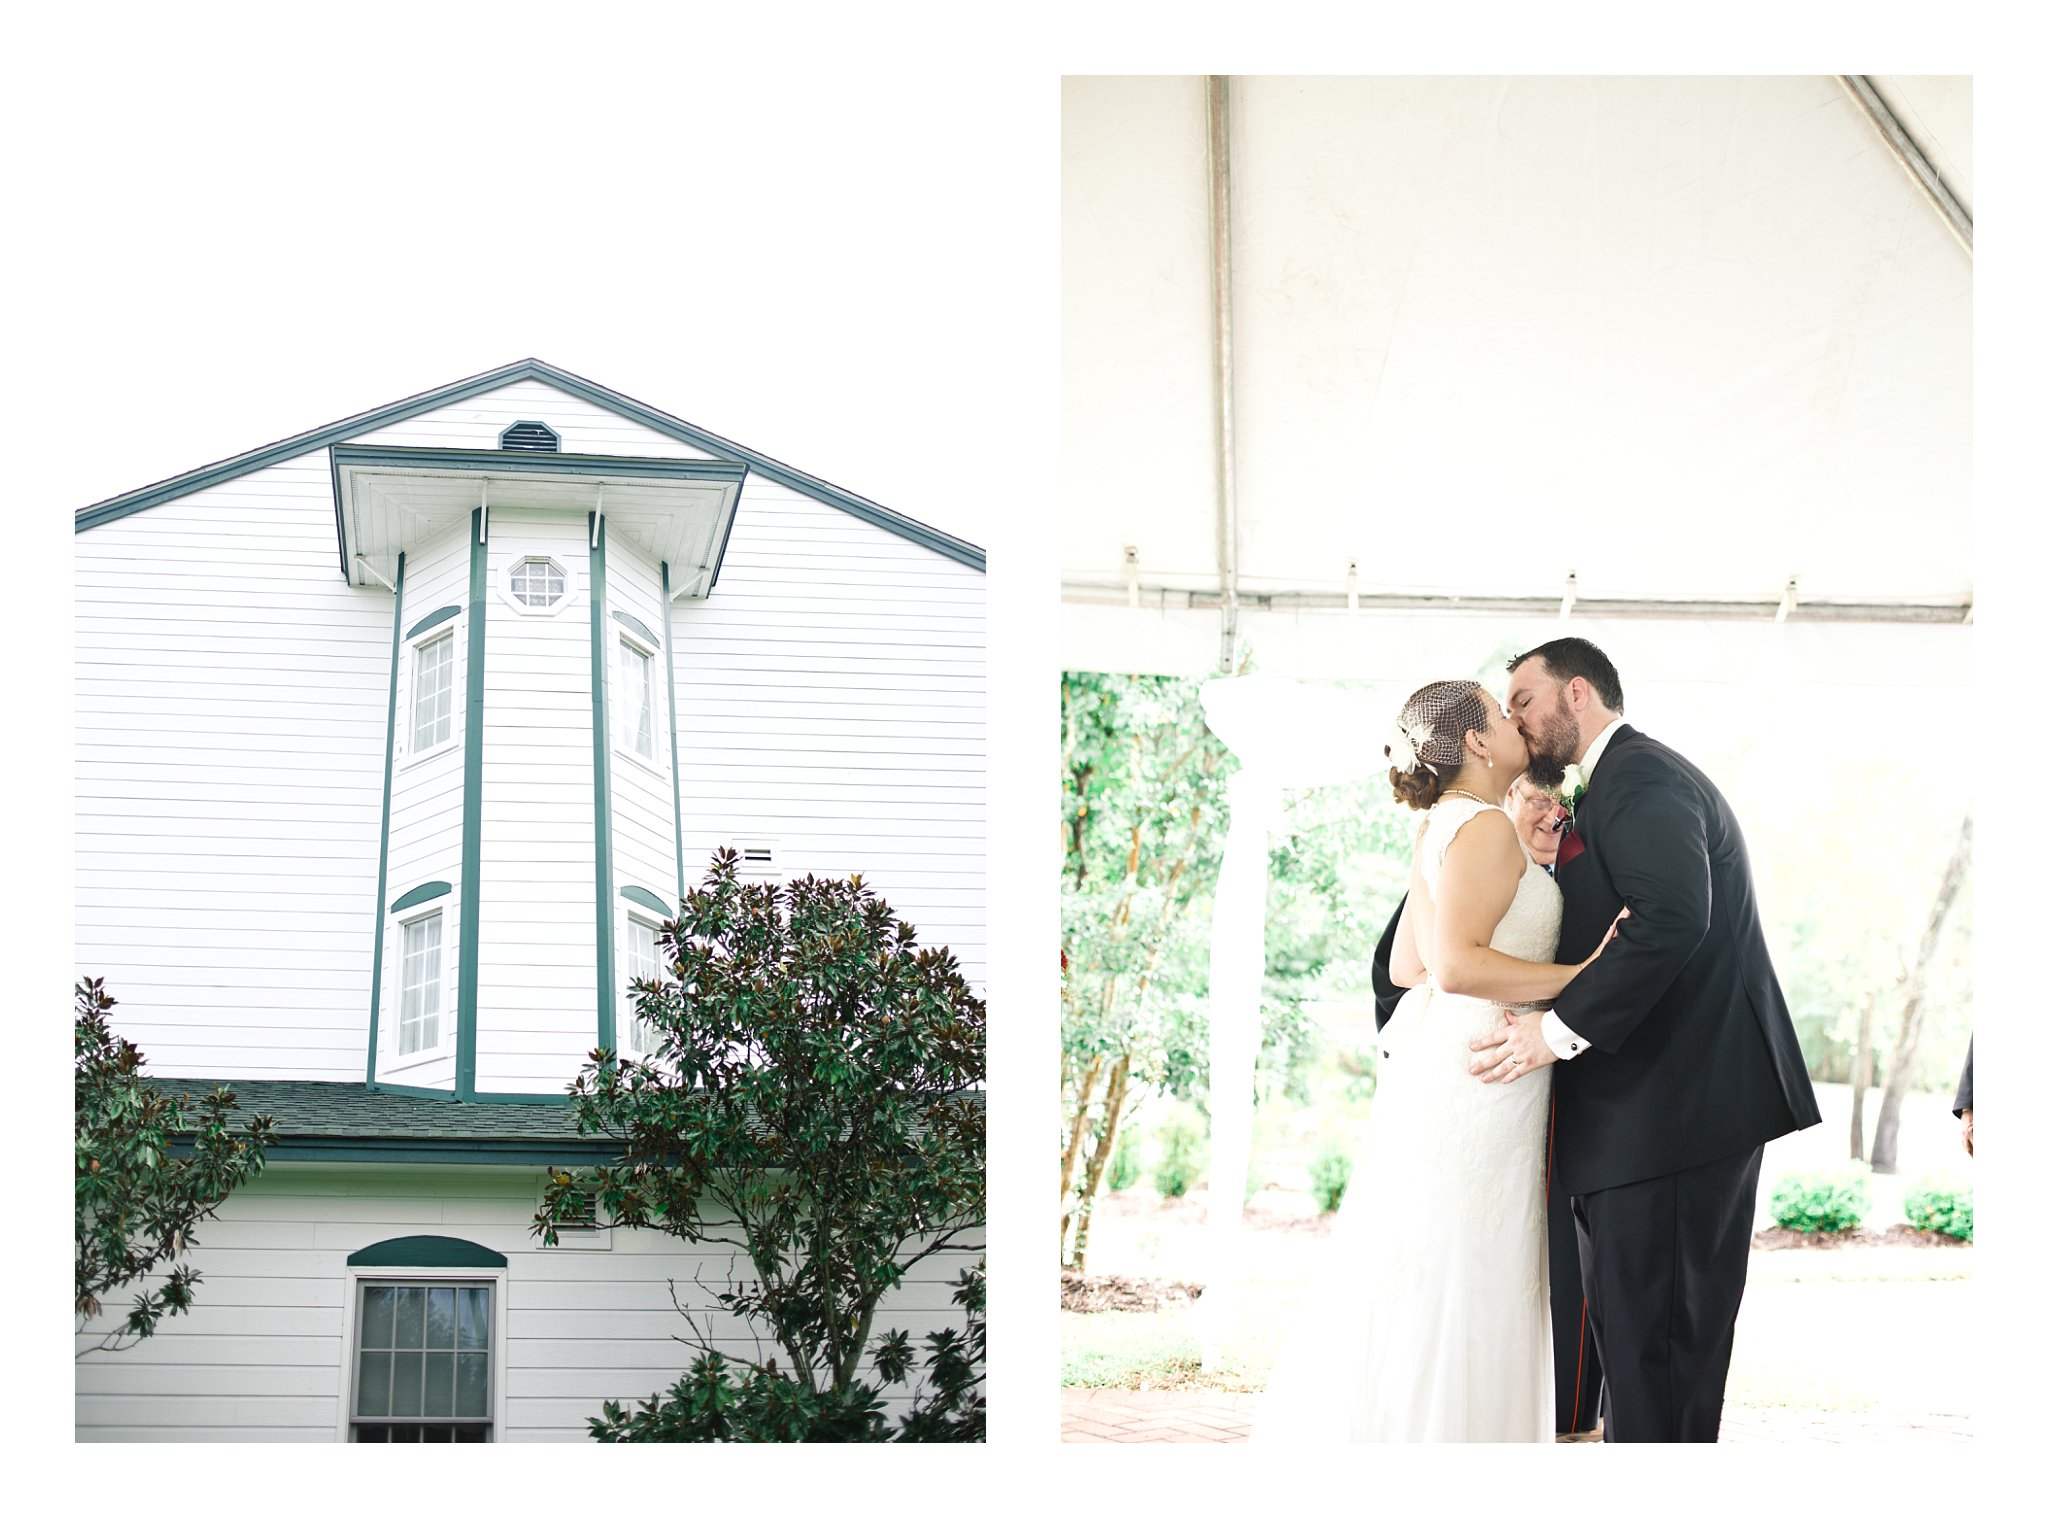 cypress-inn-garnet-black-lowcountry-vintage-wedding-conway-sc-photos_0143.jpg